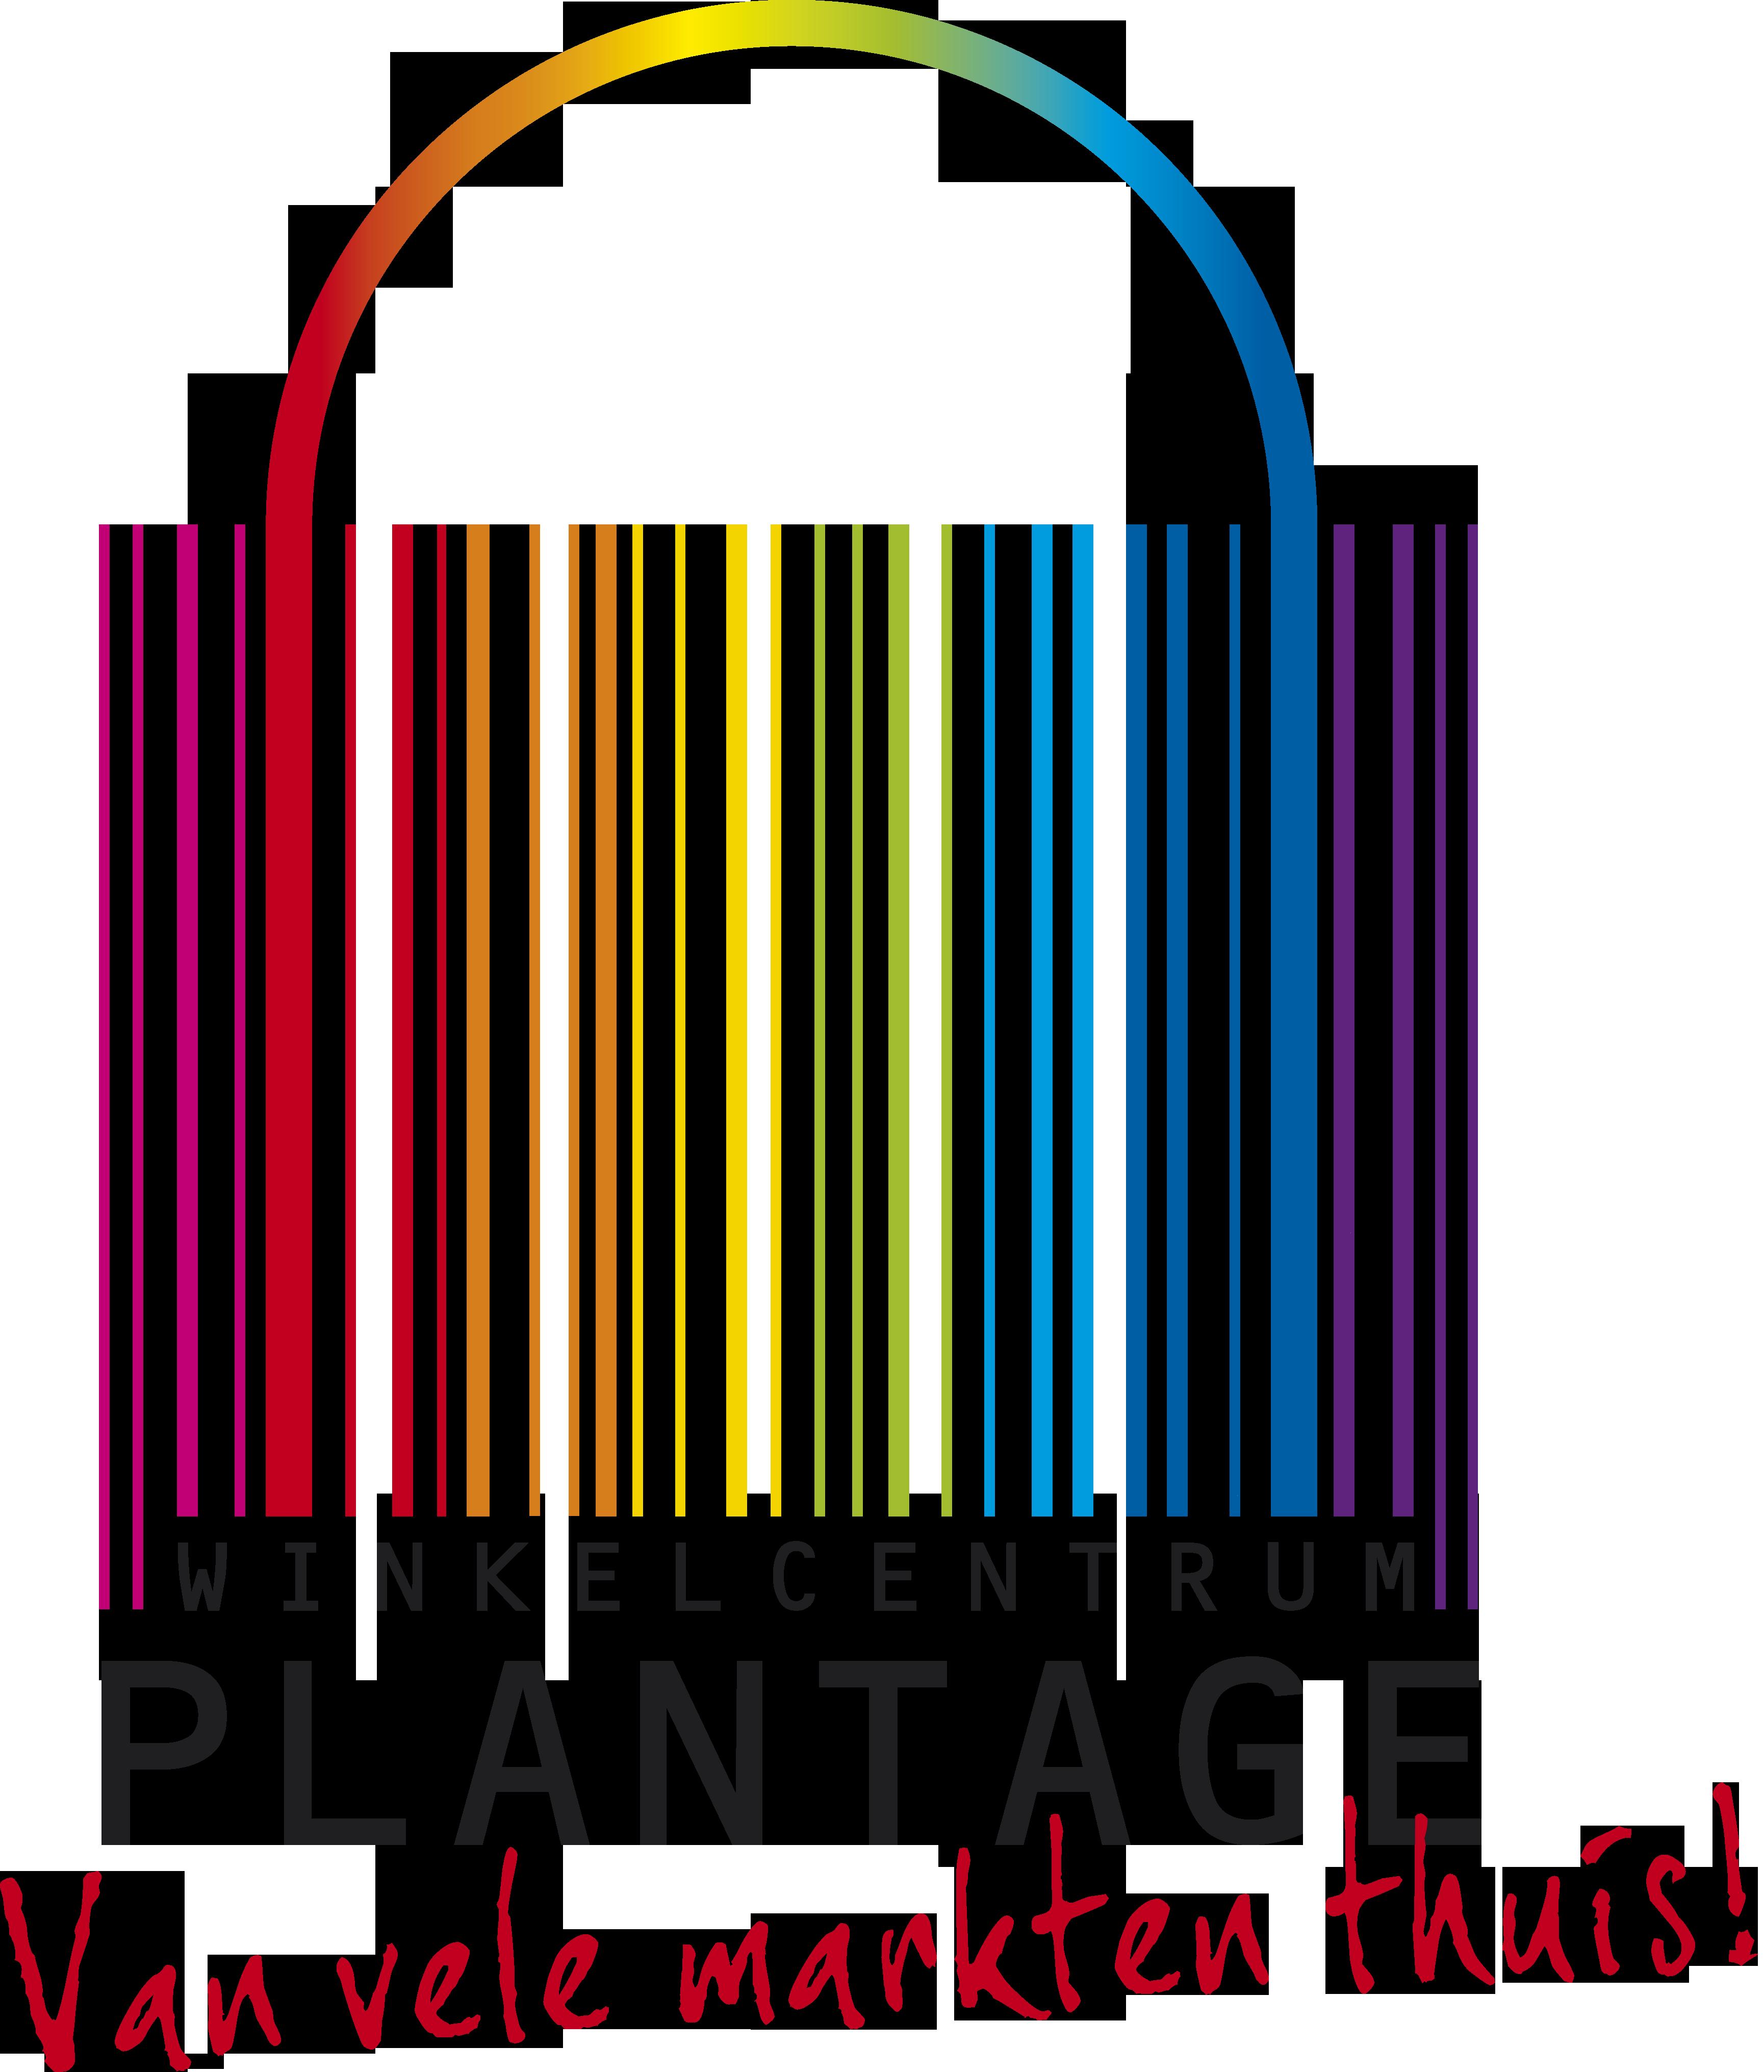 Winkelcentrum Plantage